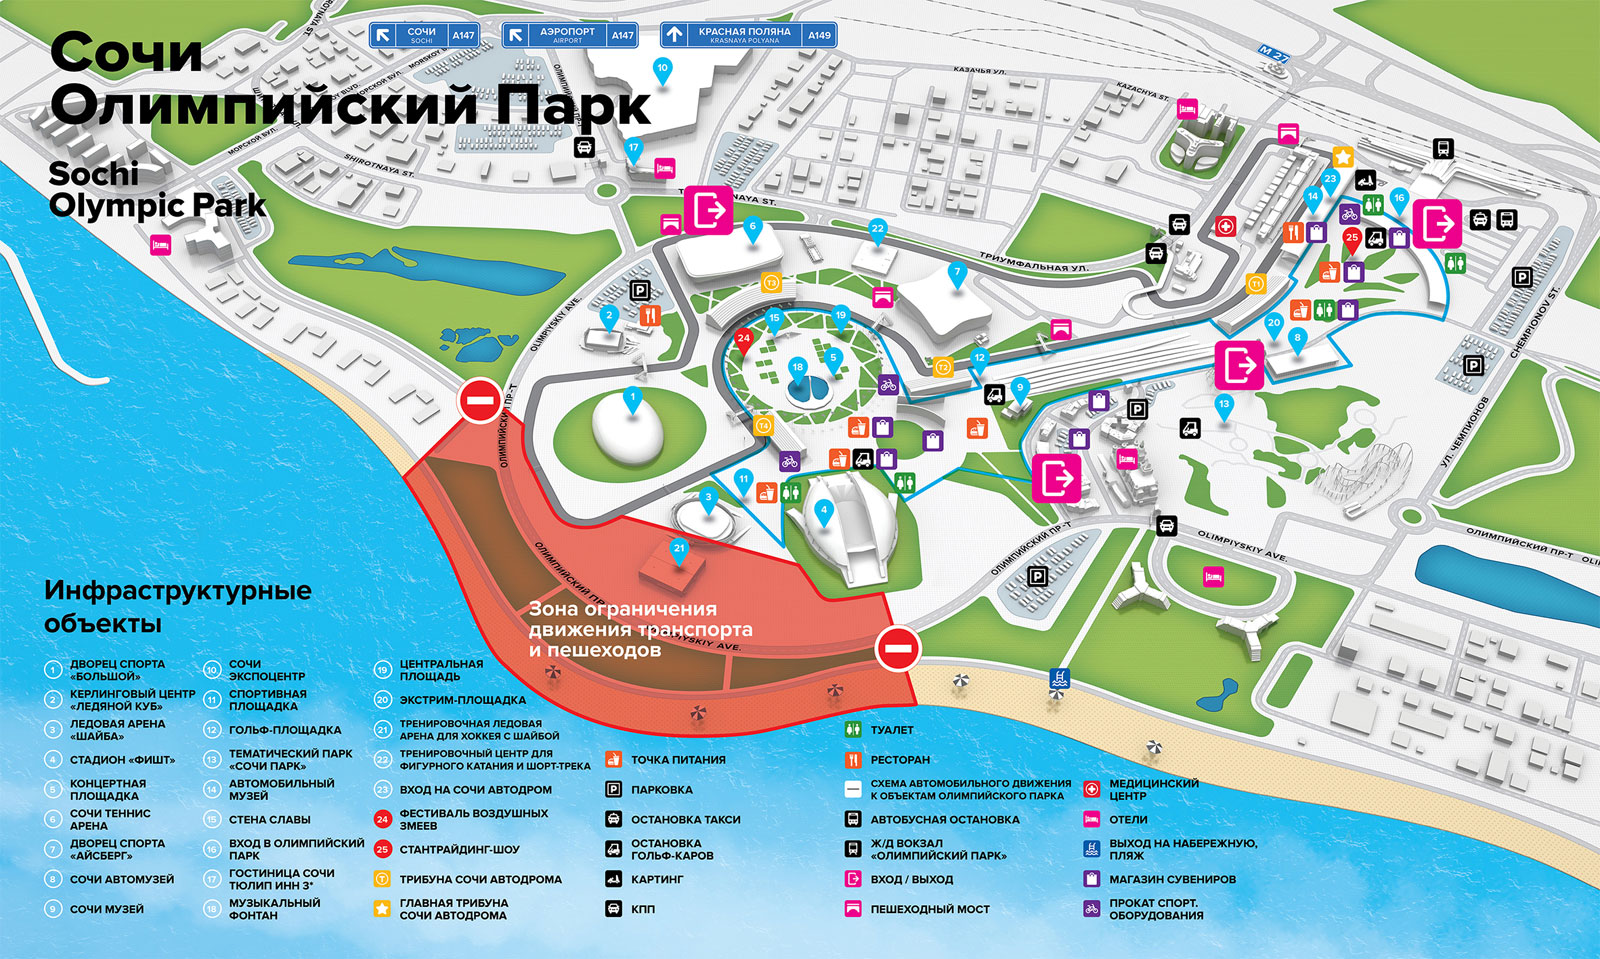 Где находиться олимпийском парке